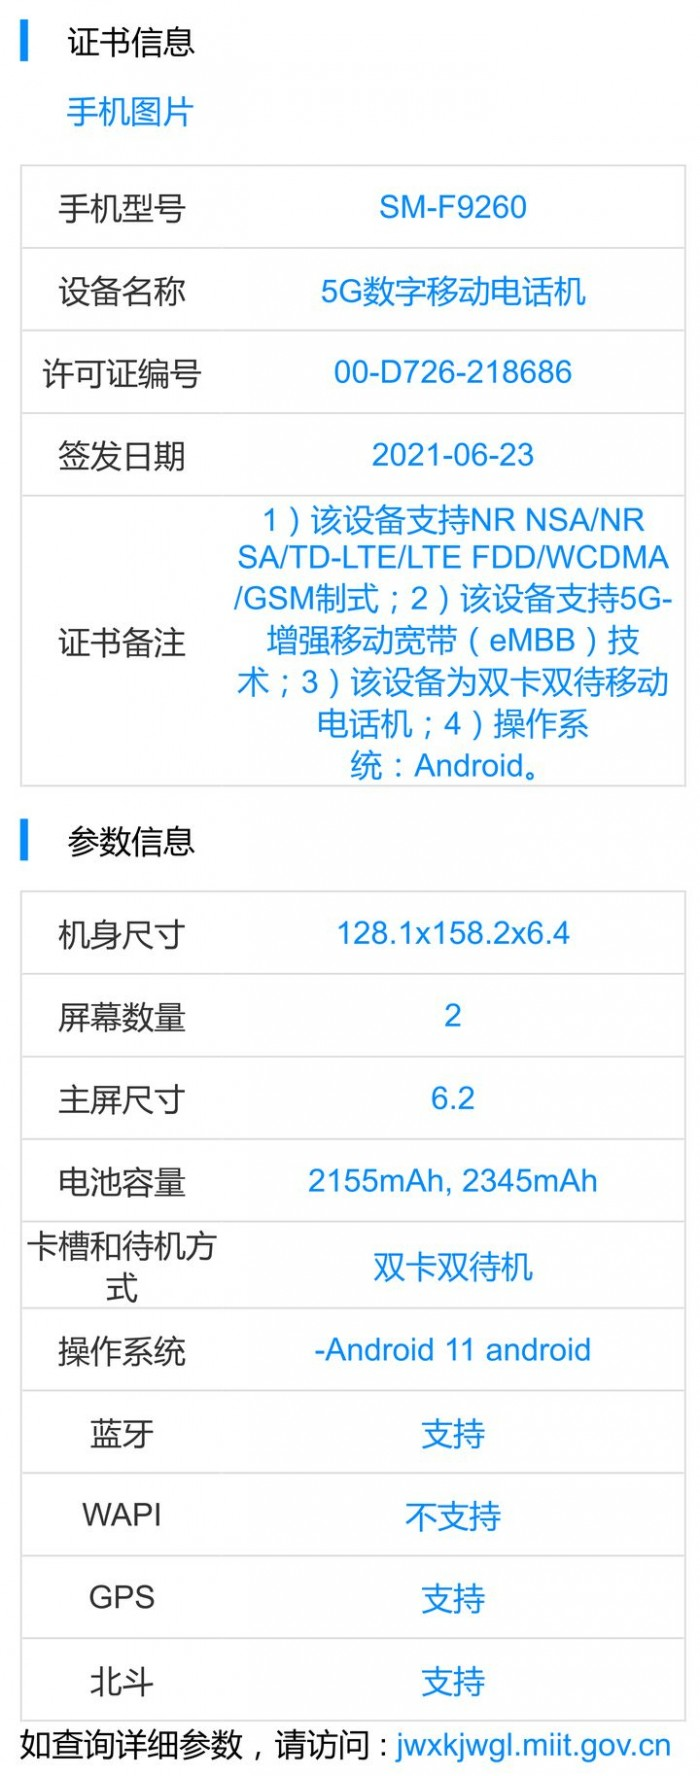 Screenshot 2021-07-12 at 14-05-28 電信設備進網許可(含試用)審批.jpg